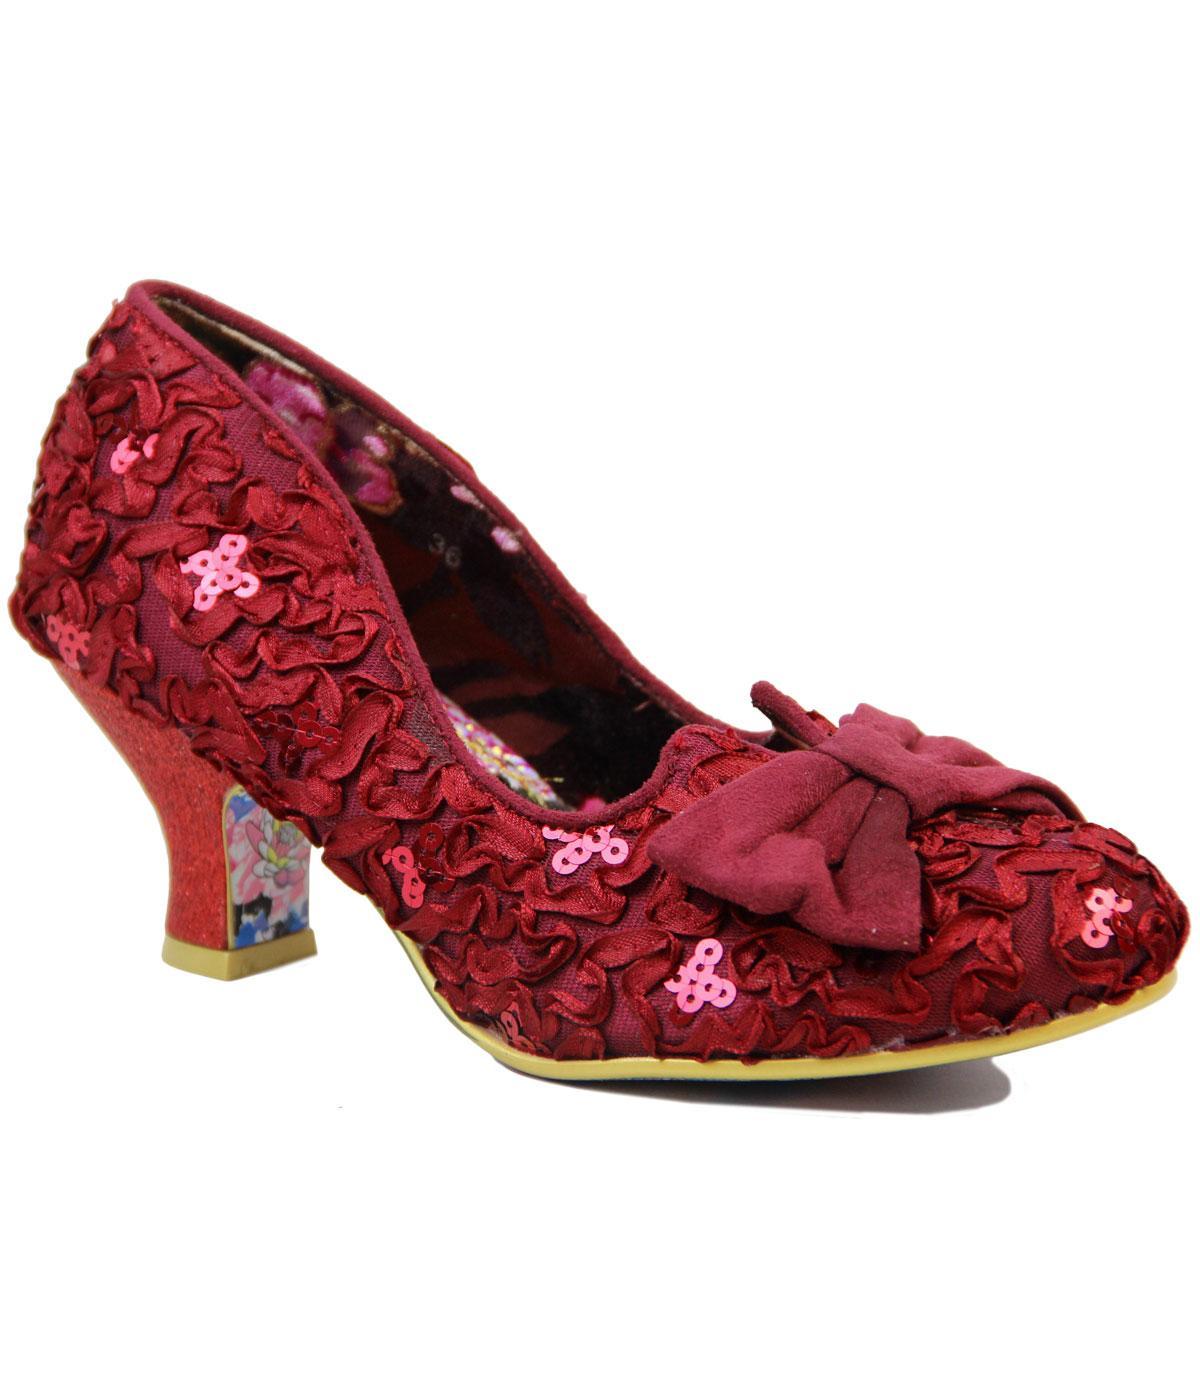 Dazzle Razzle Shoes  Red Irregular Choice